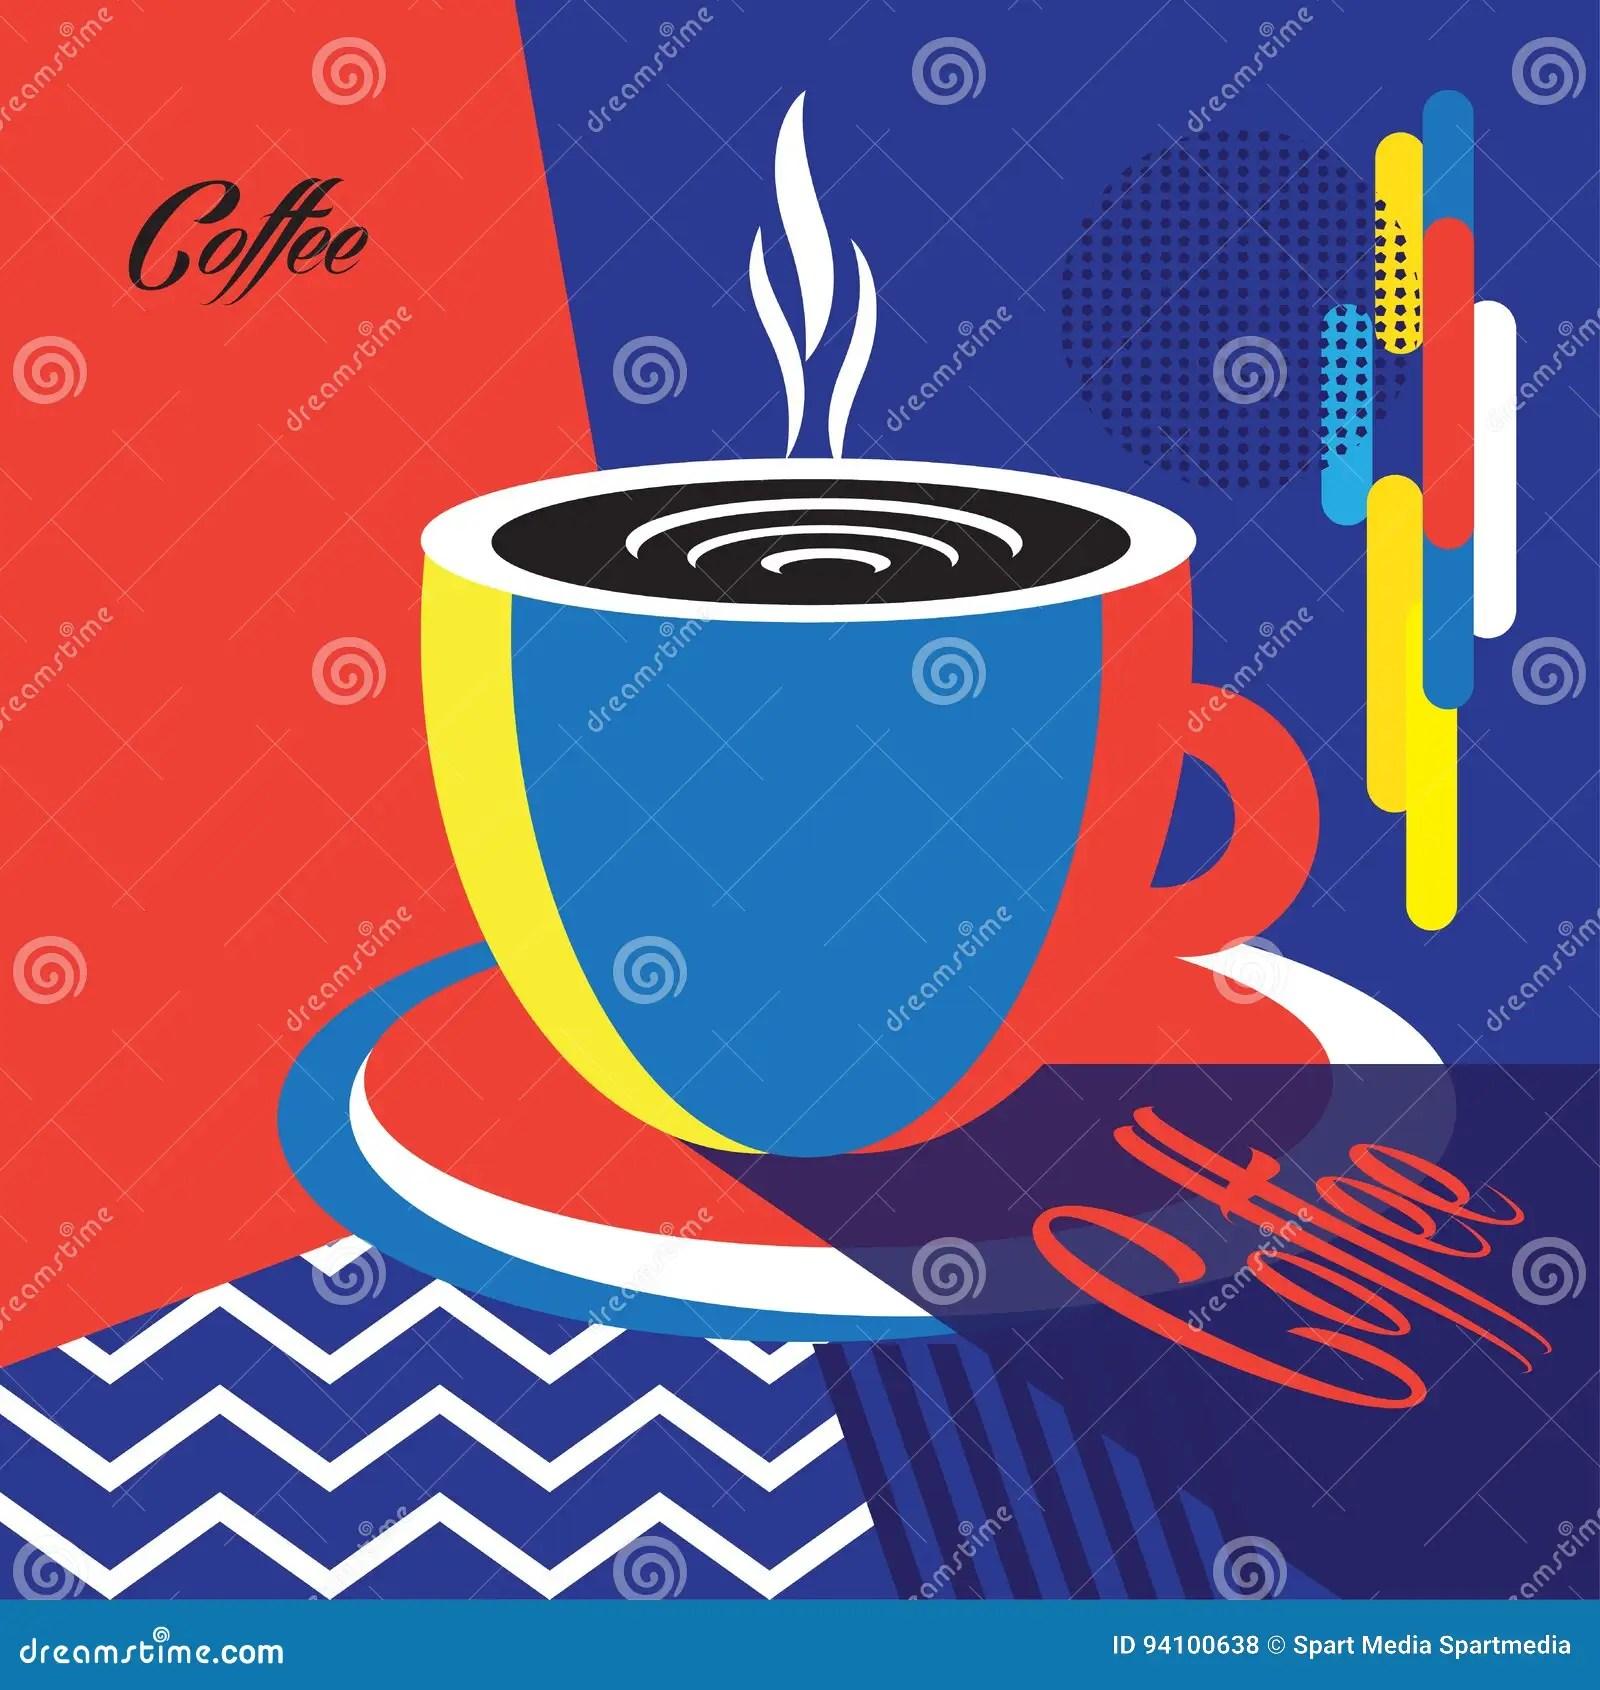 coffee cup logo design trendy pop art poster illustration 94100638 megapixl